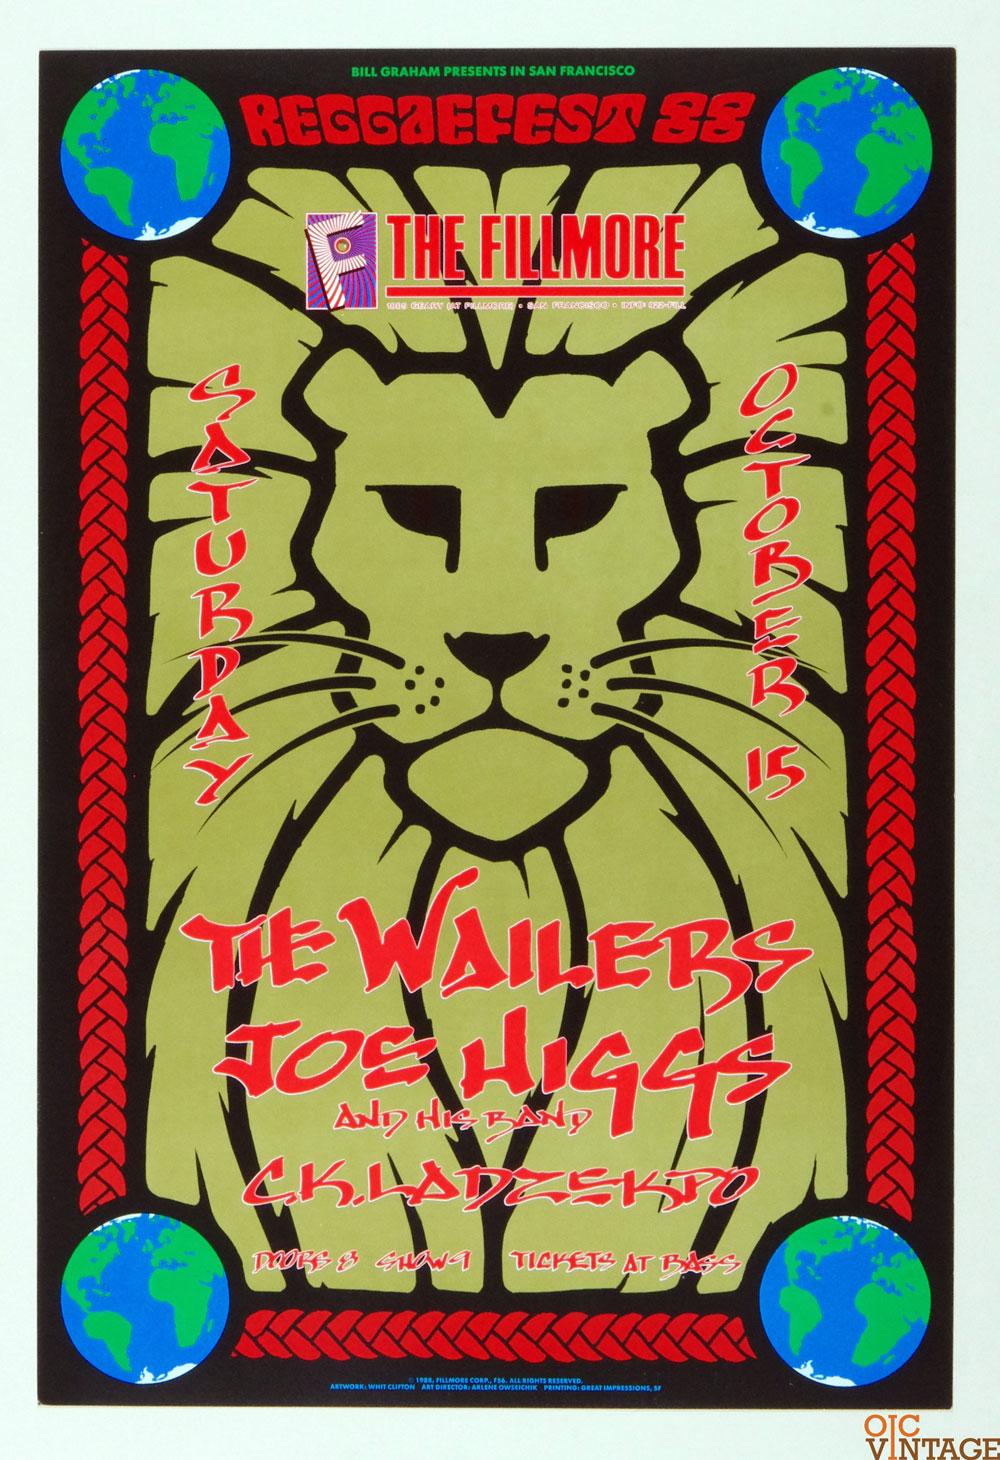 The Wailers Joe Higgs Poster 1988 Oct 15 New Fillmore